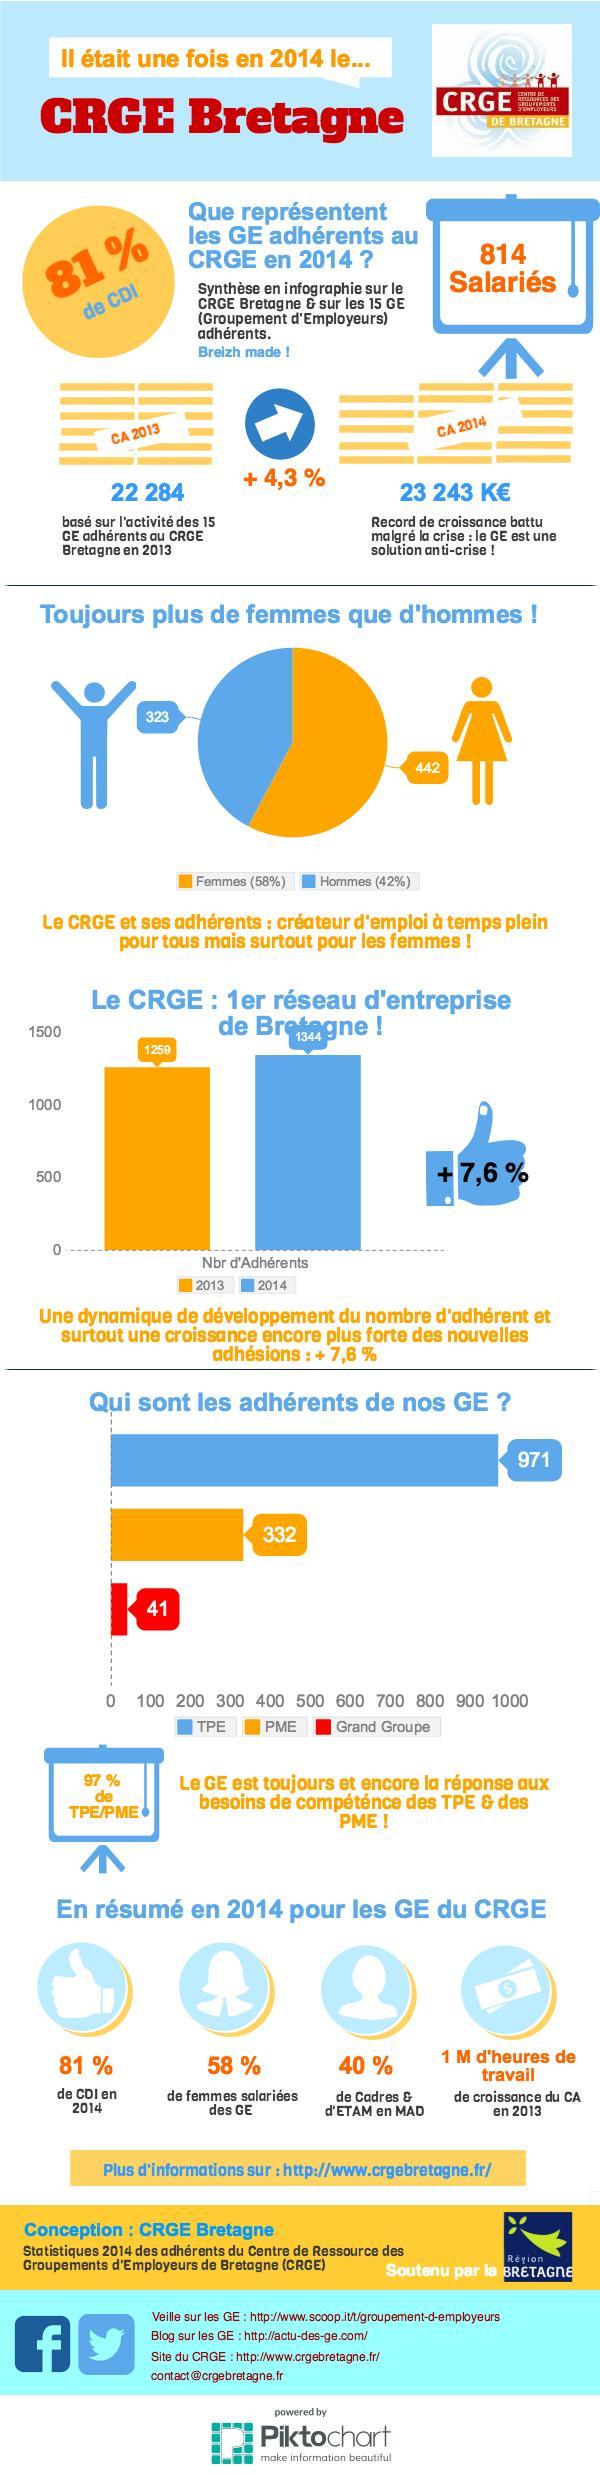 Infographie CRGE Bretagne 2014